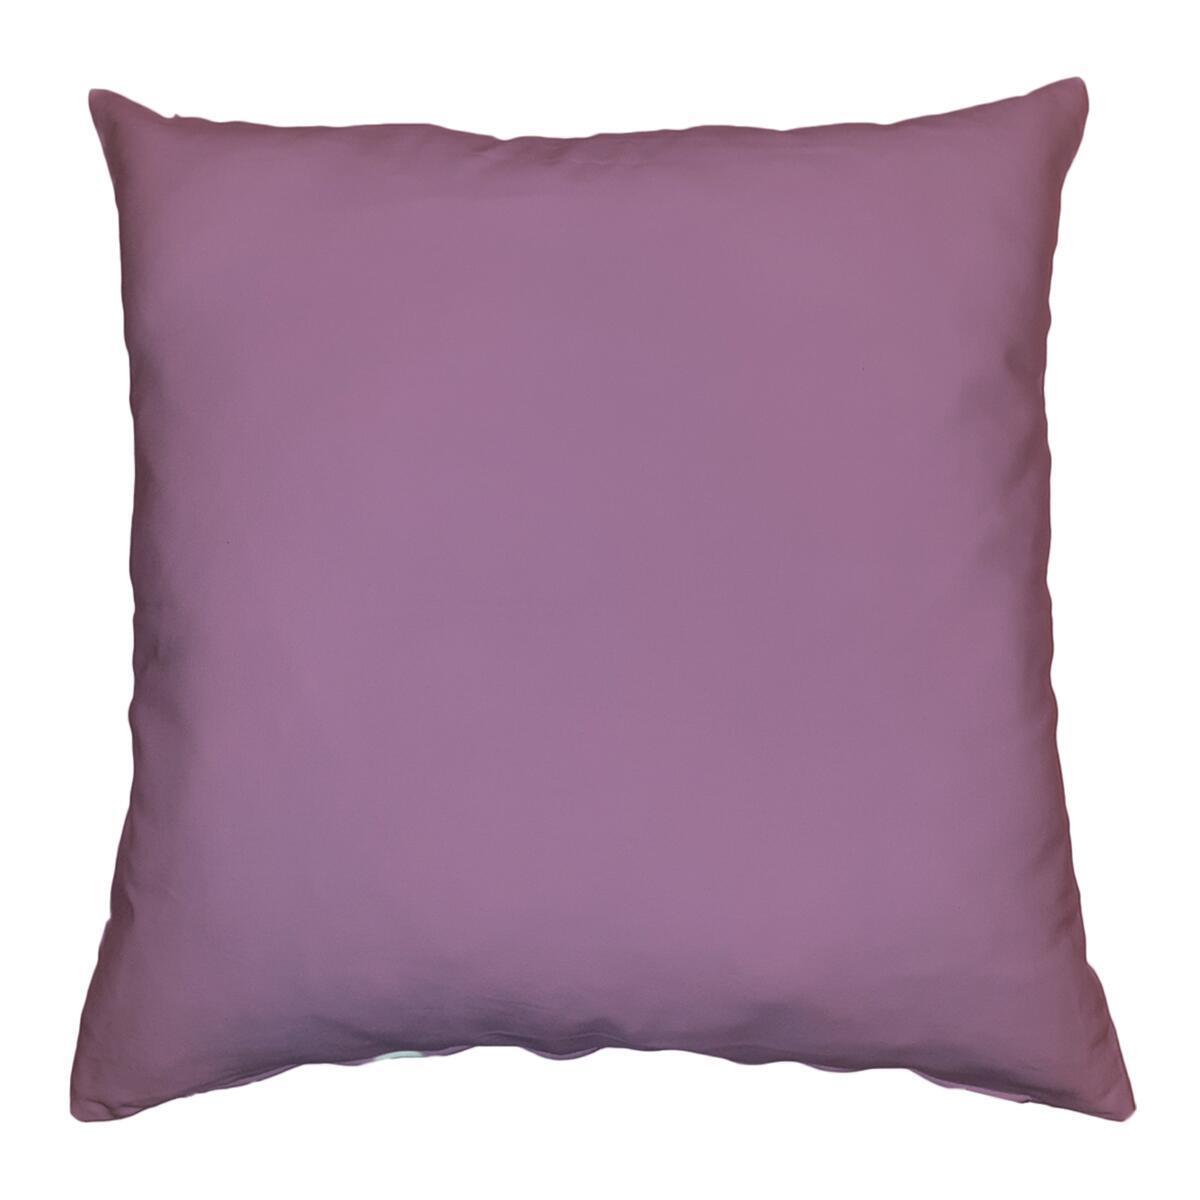 Cuscino Loneta lilla 70x70 cm - 1